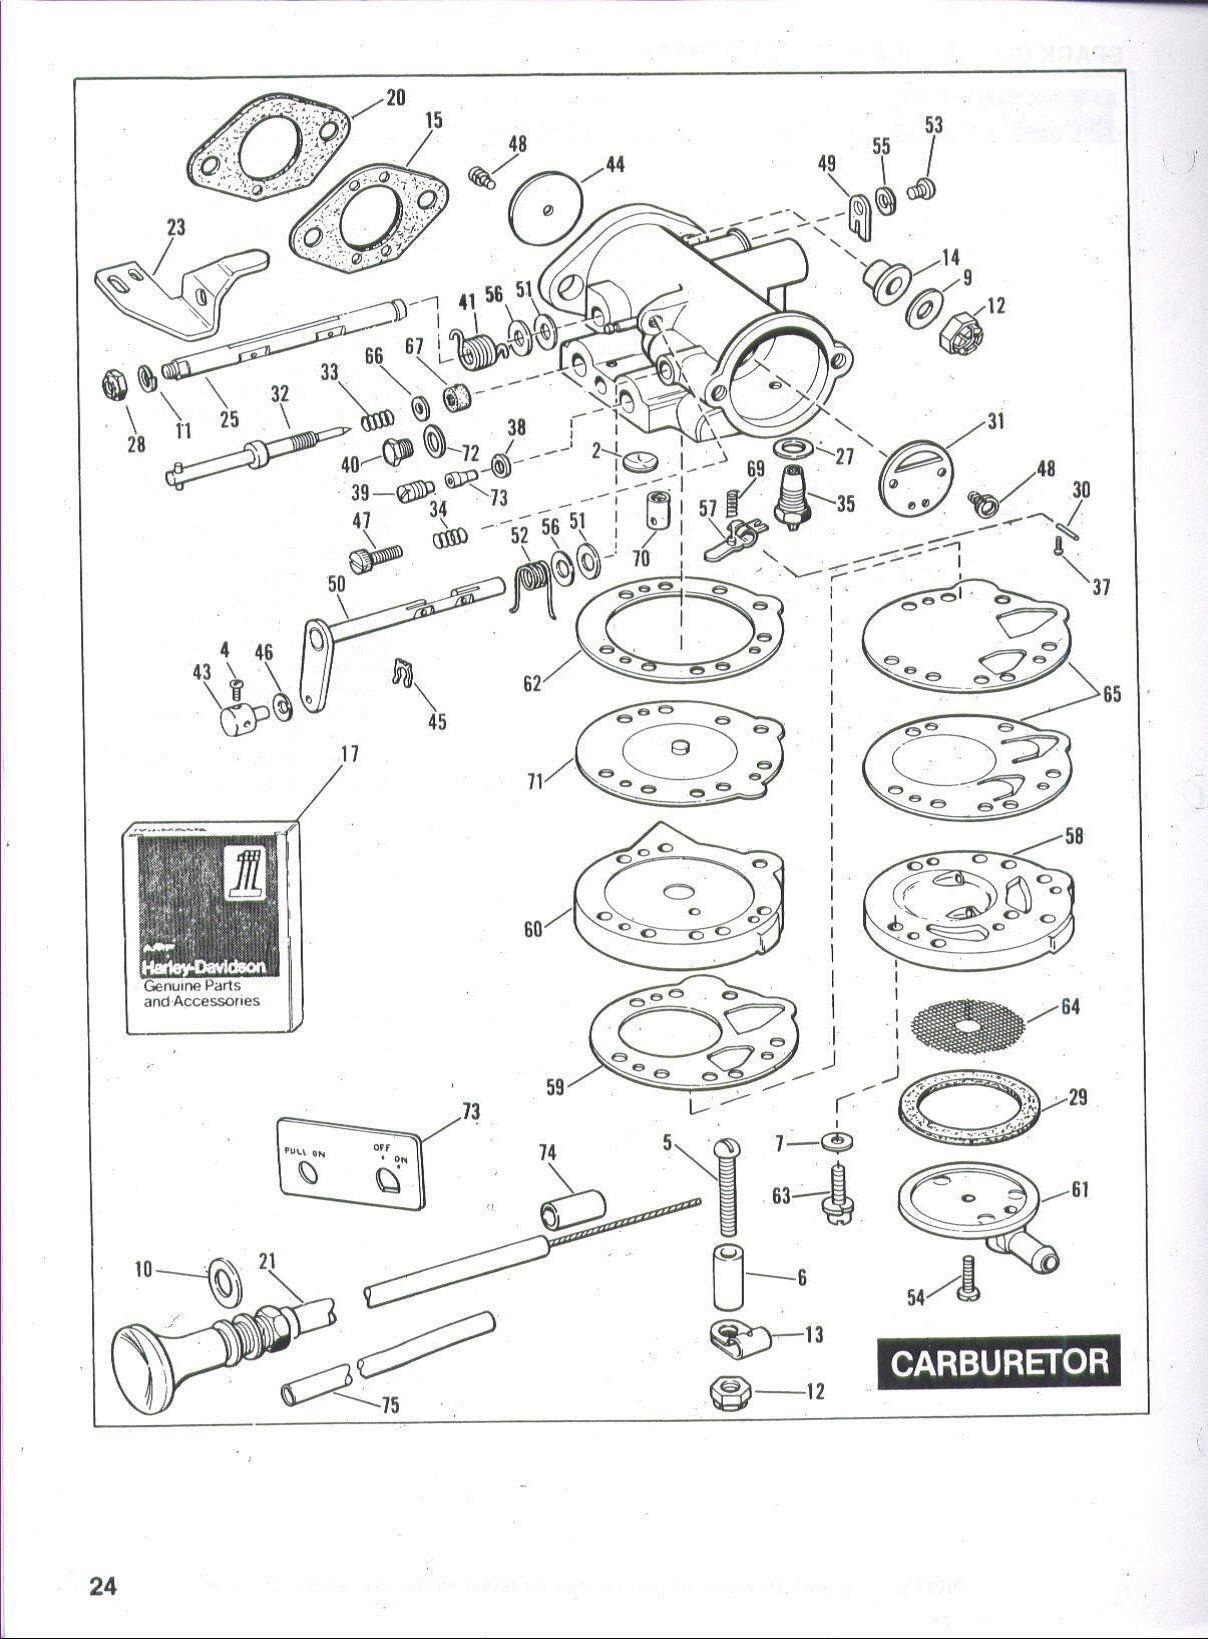 Truck Driving Championship Course Diagrams Harley Davidson Golf Cart Carburetor Diagram Utv Stuff Of Truck Driving Championship Course Diagrams